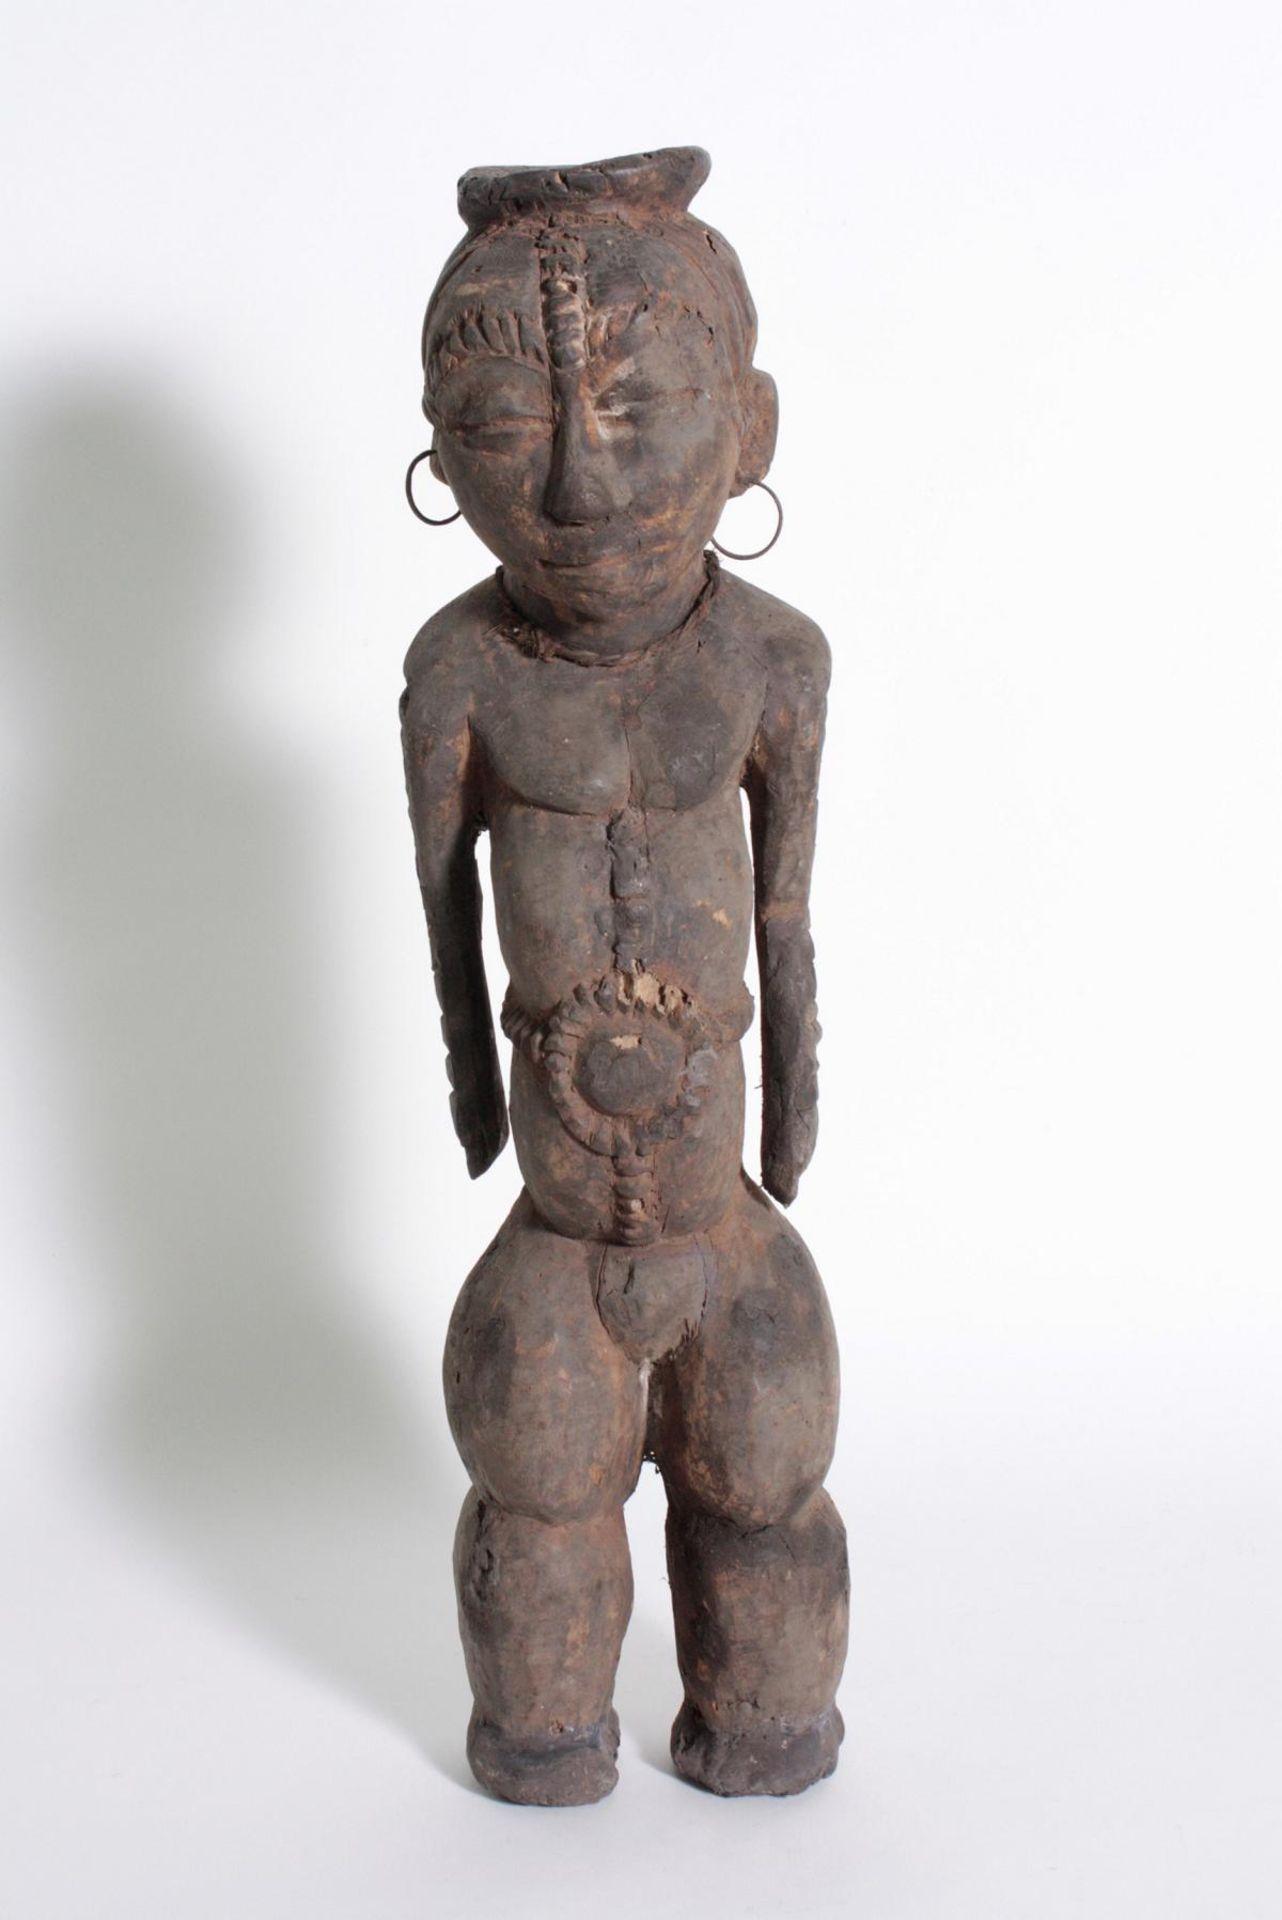 Ältere Ahnen-Figur, Tabwa, D. R. Kongo